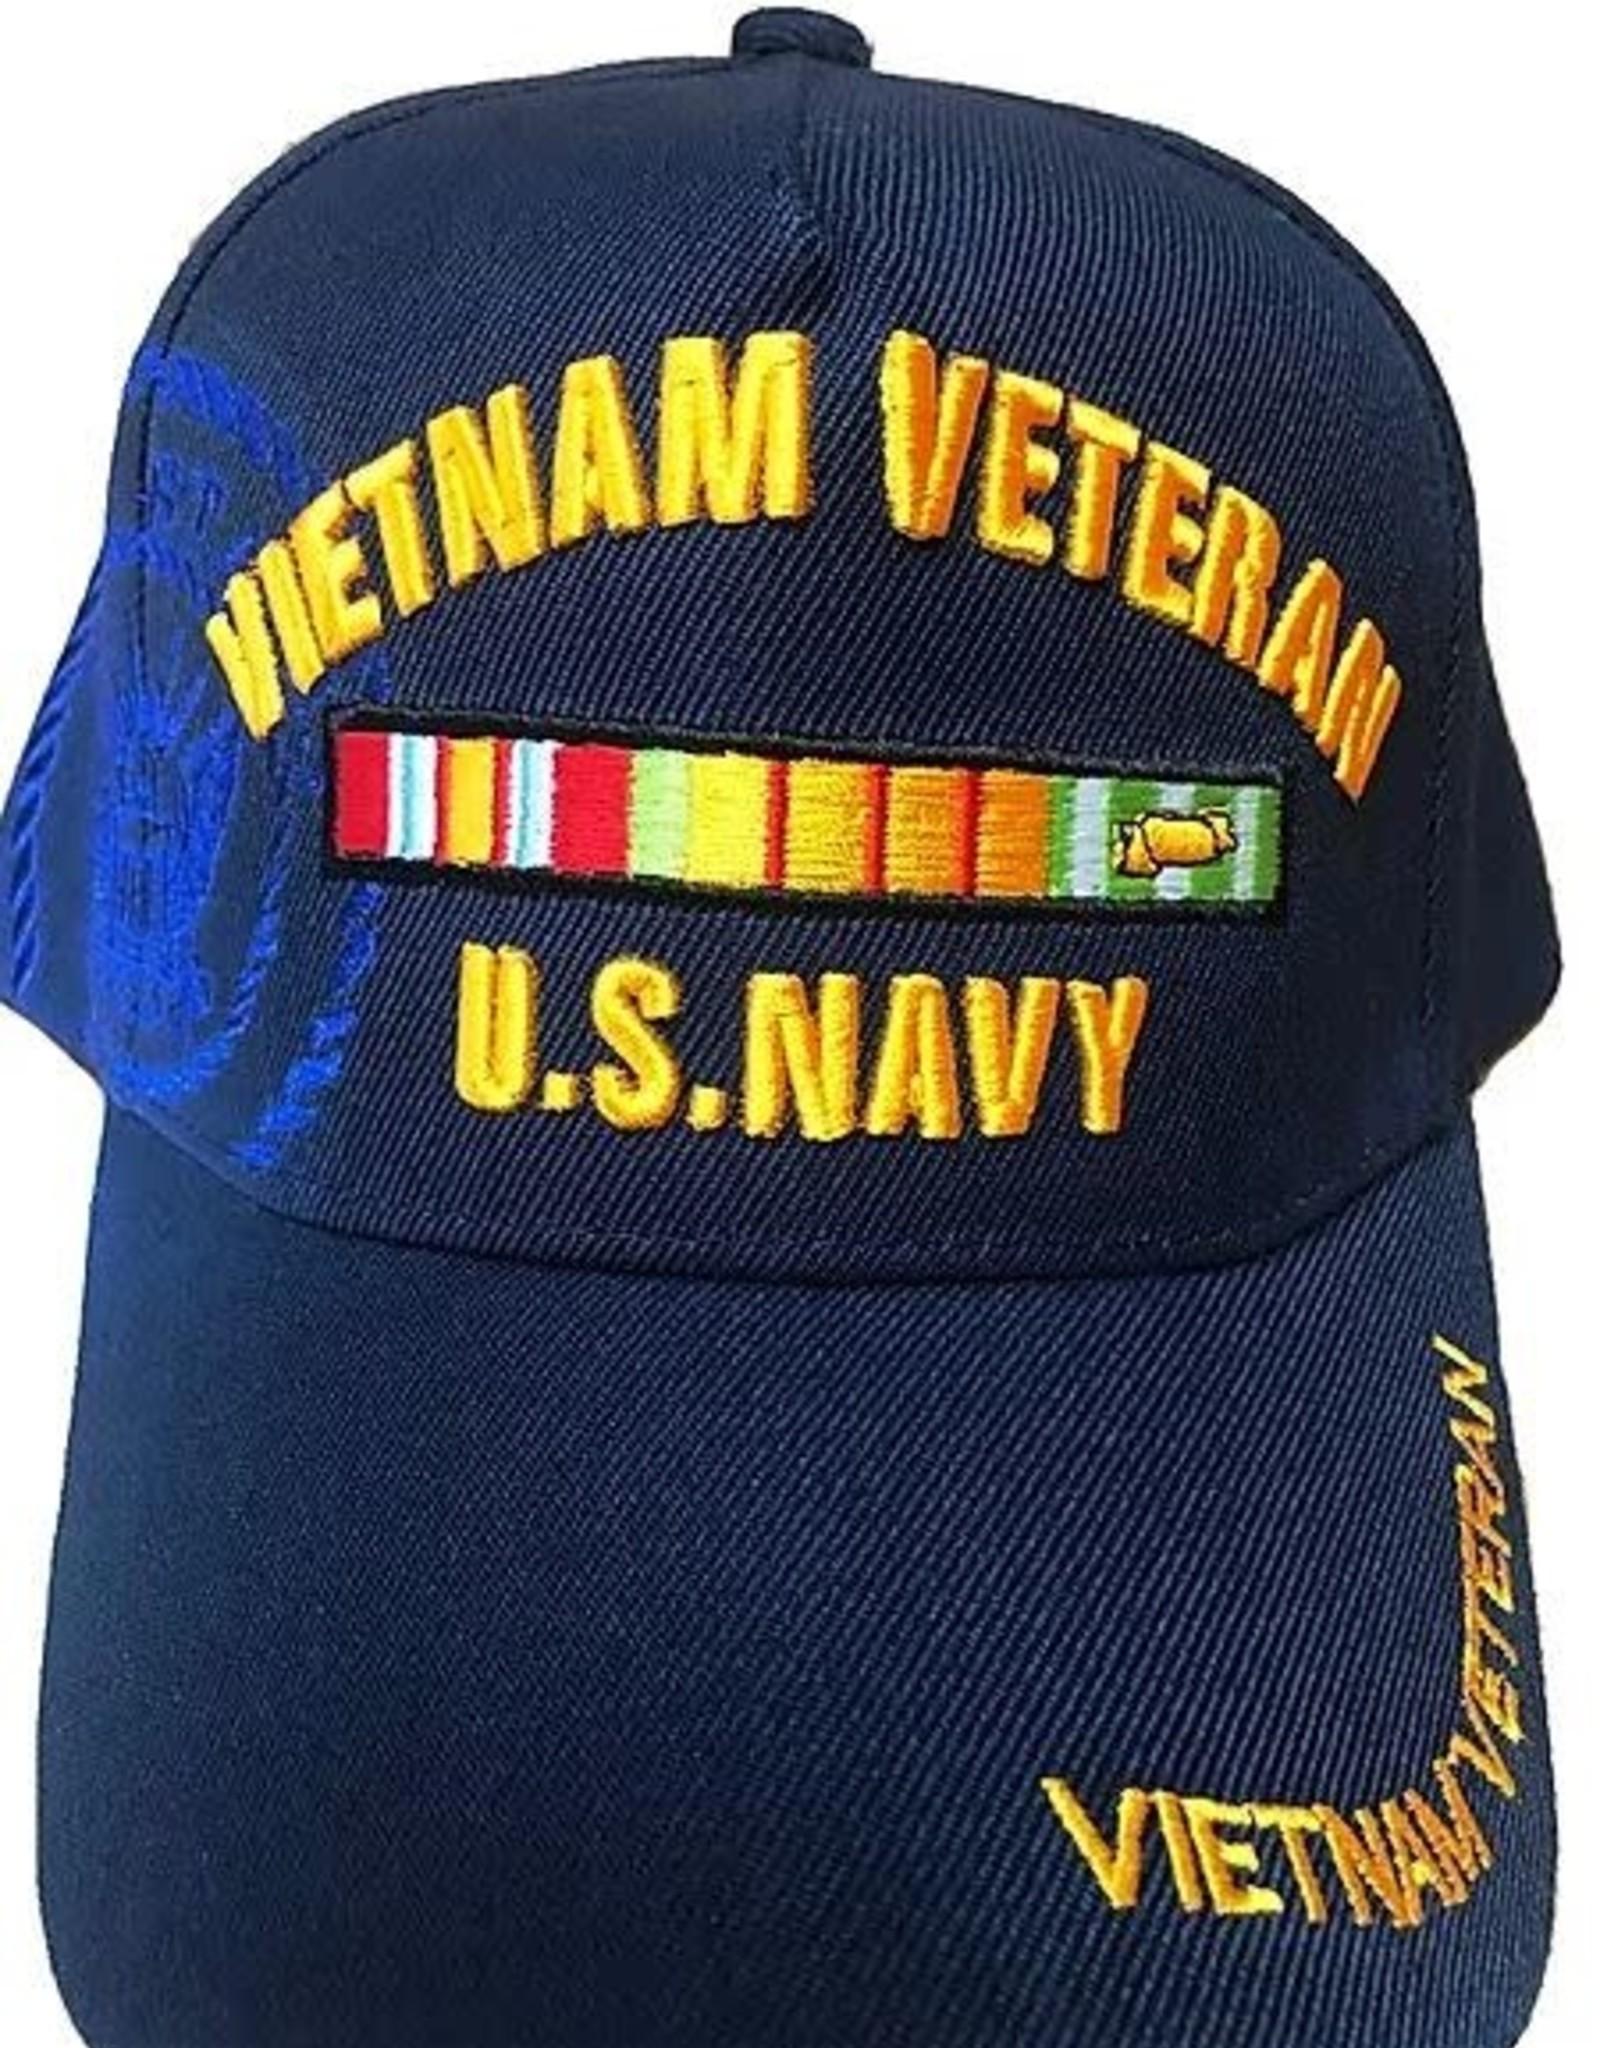 MidMil U.S. Navy Vietnam Veteran Hat with Ribbons and Shadow Dark Blue